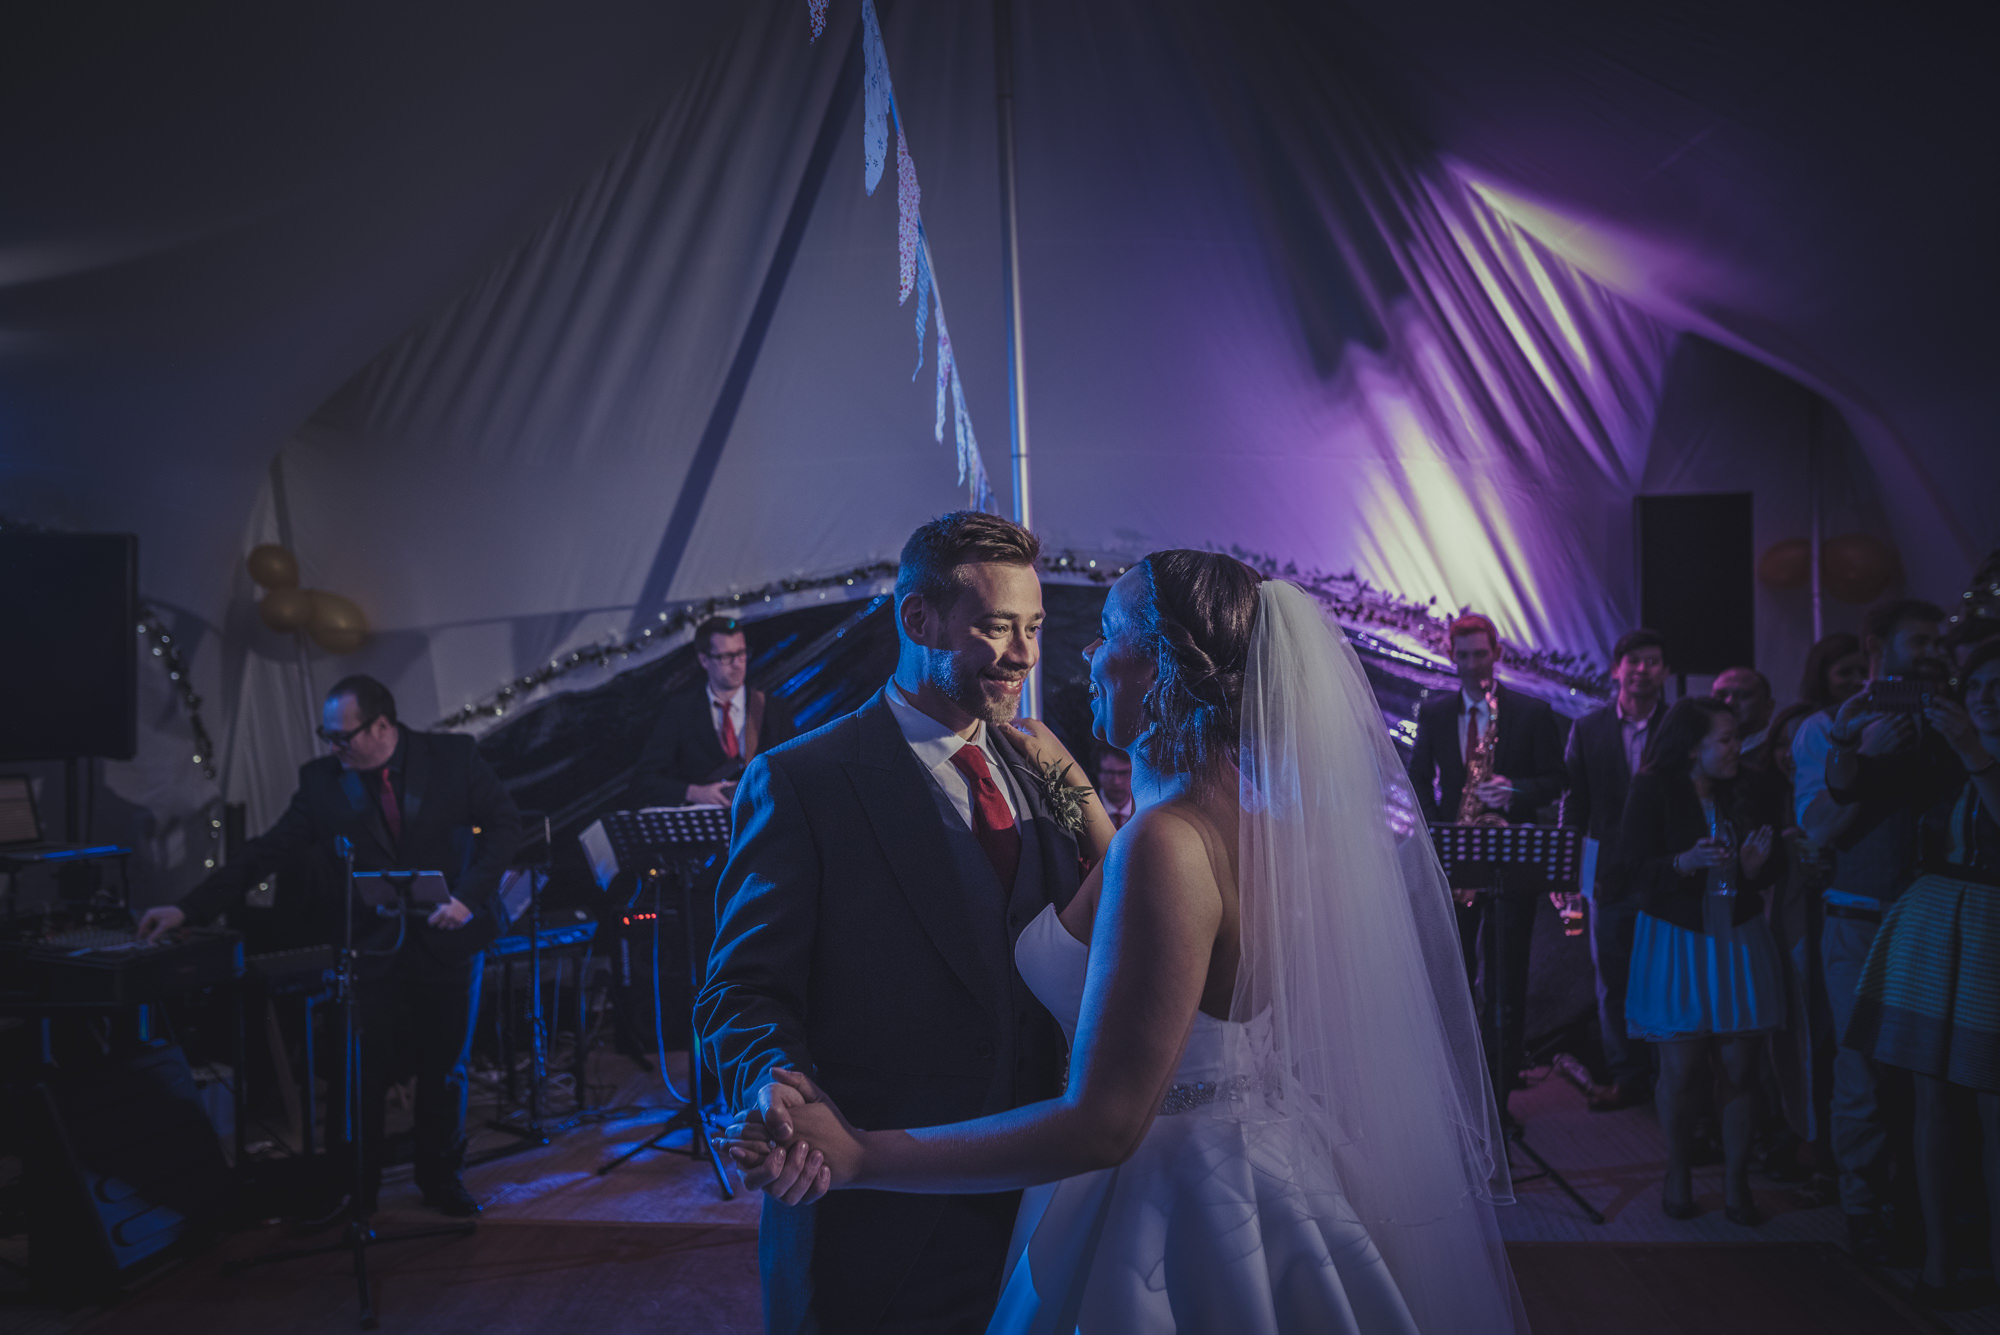 Jacqueline-Gareth-Wedding-Westmead-Events-Surrey-Manu-Mendoza-Wedding-Photography-509.jpg